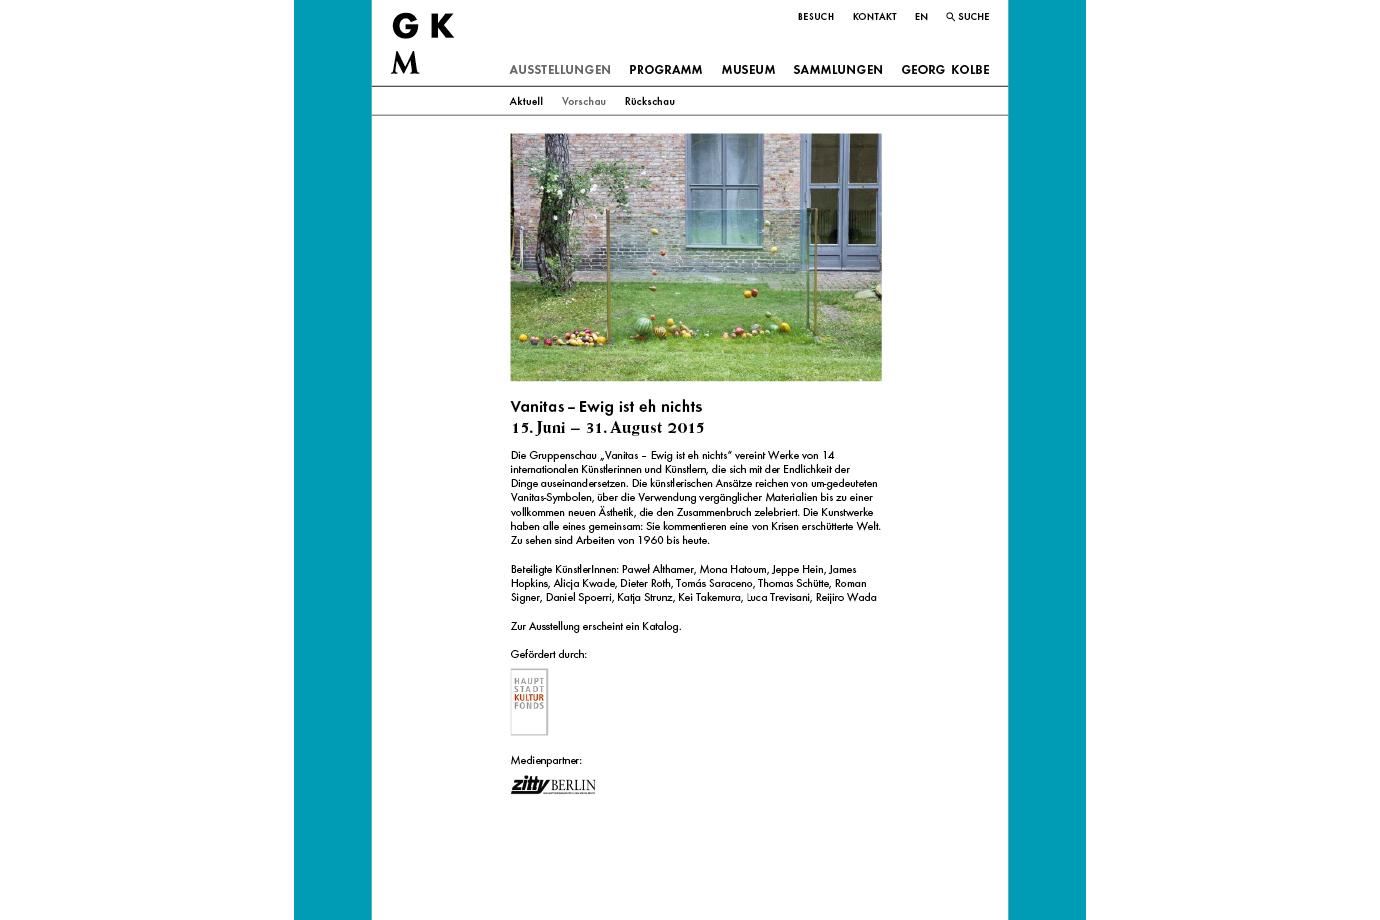 http://e-o-t.de/wordpress/wp-content/uploads/2017/12/2013_eot-GKM26.jpg